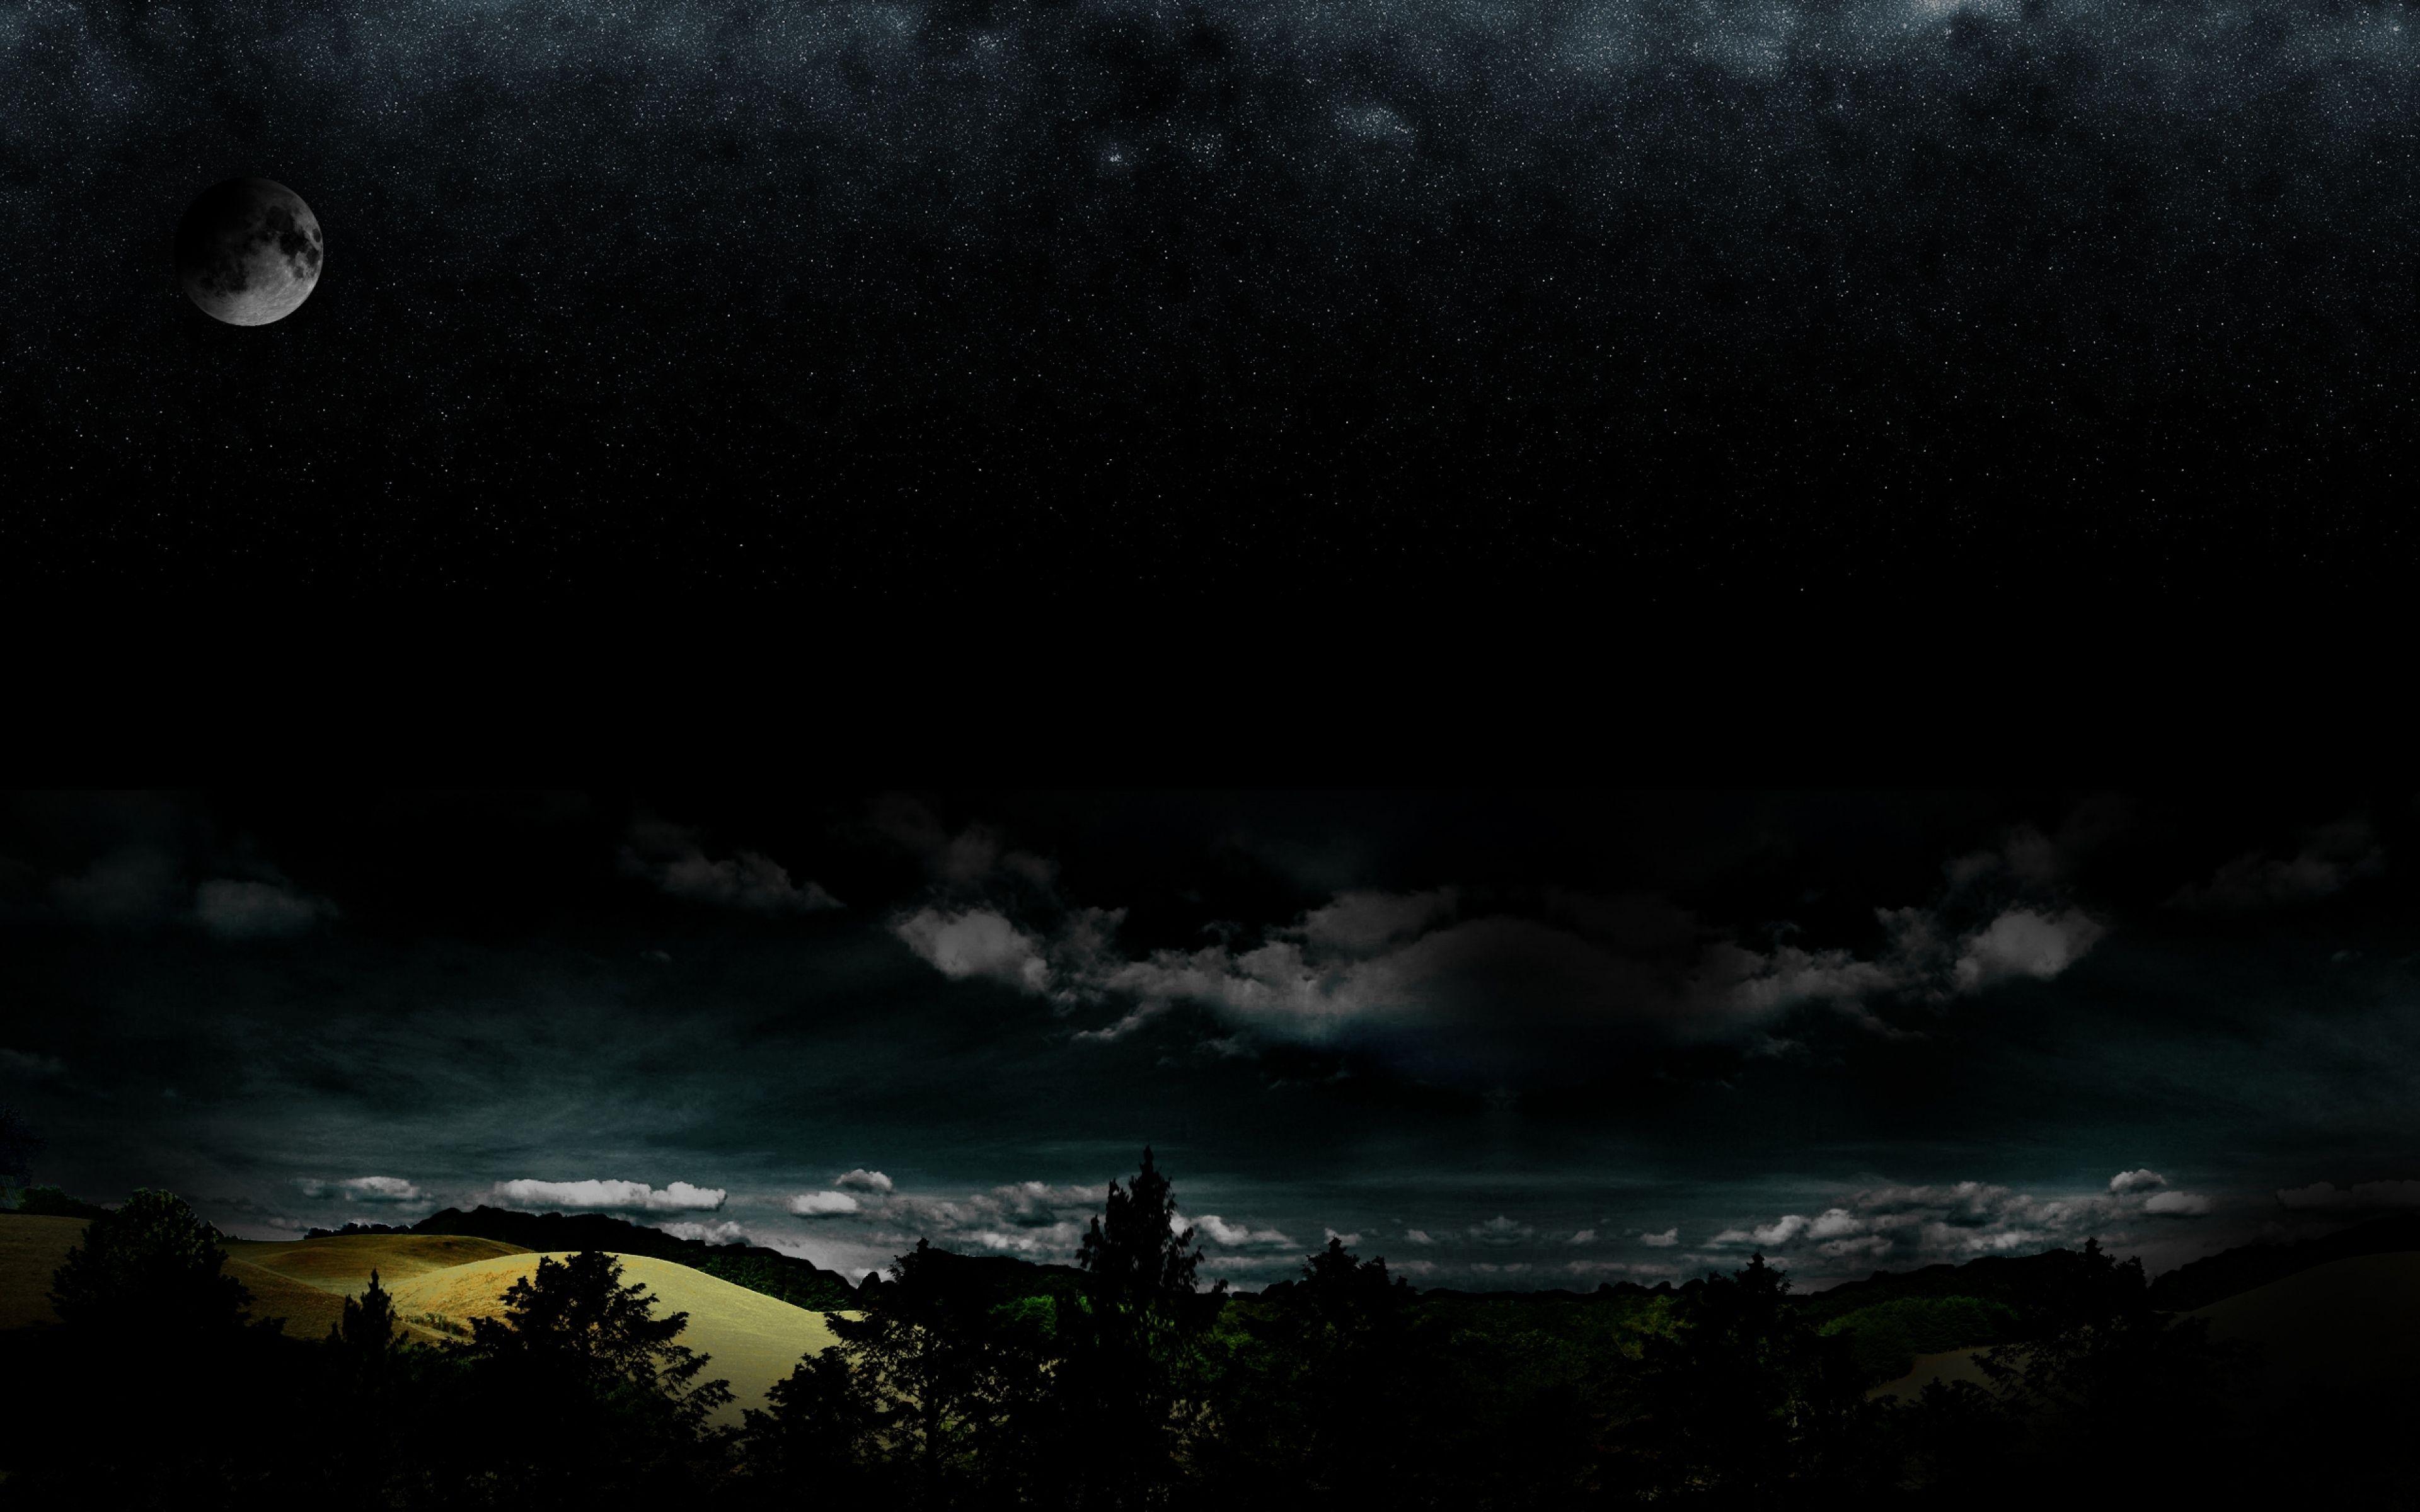 3840x2400 Wallpaper Full Moon Night Darkness Stars Wood Clouds Night Sky Wallpaper Background Clouds